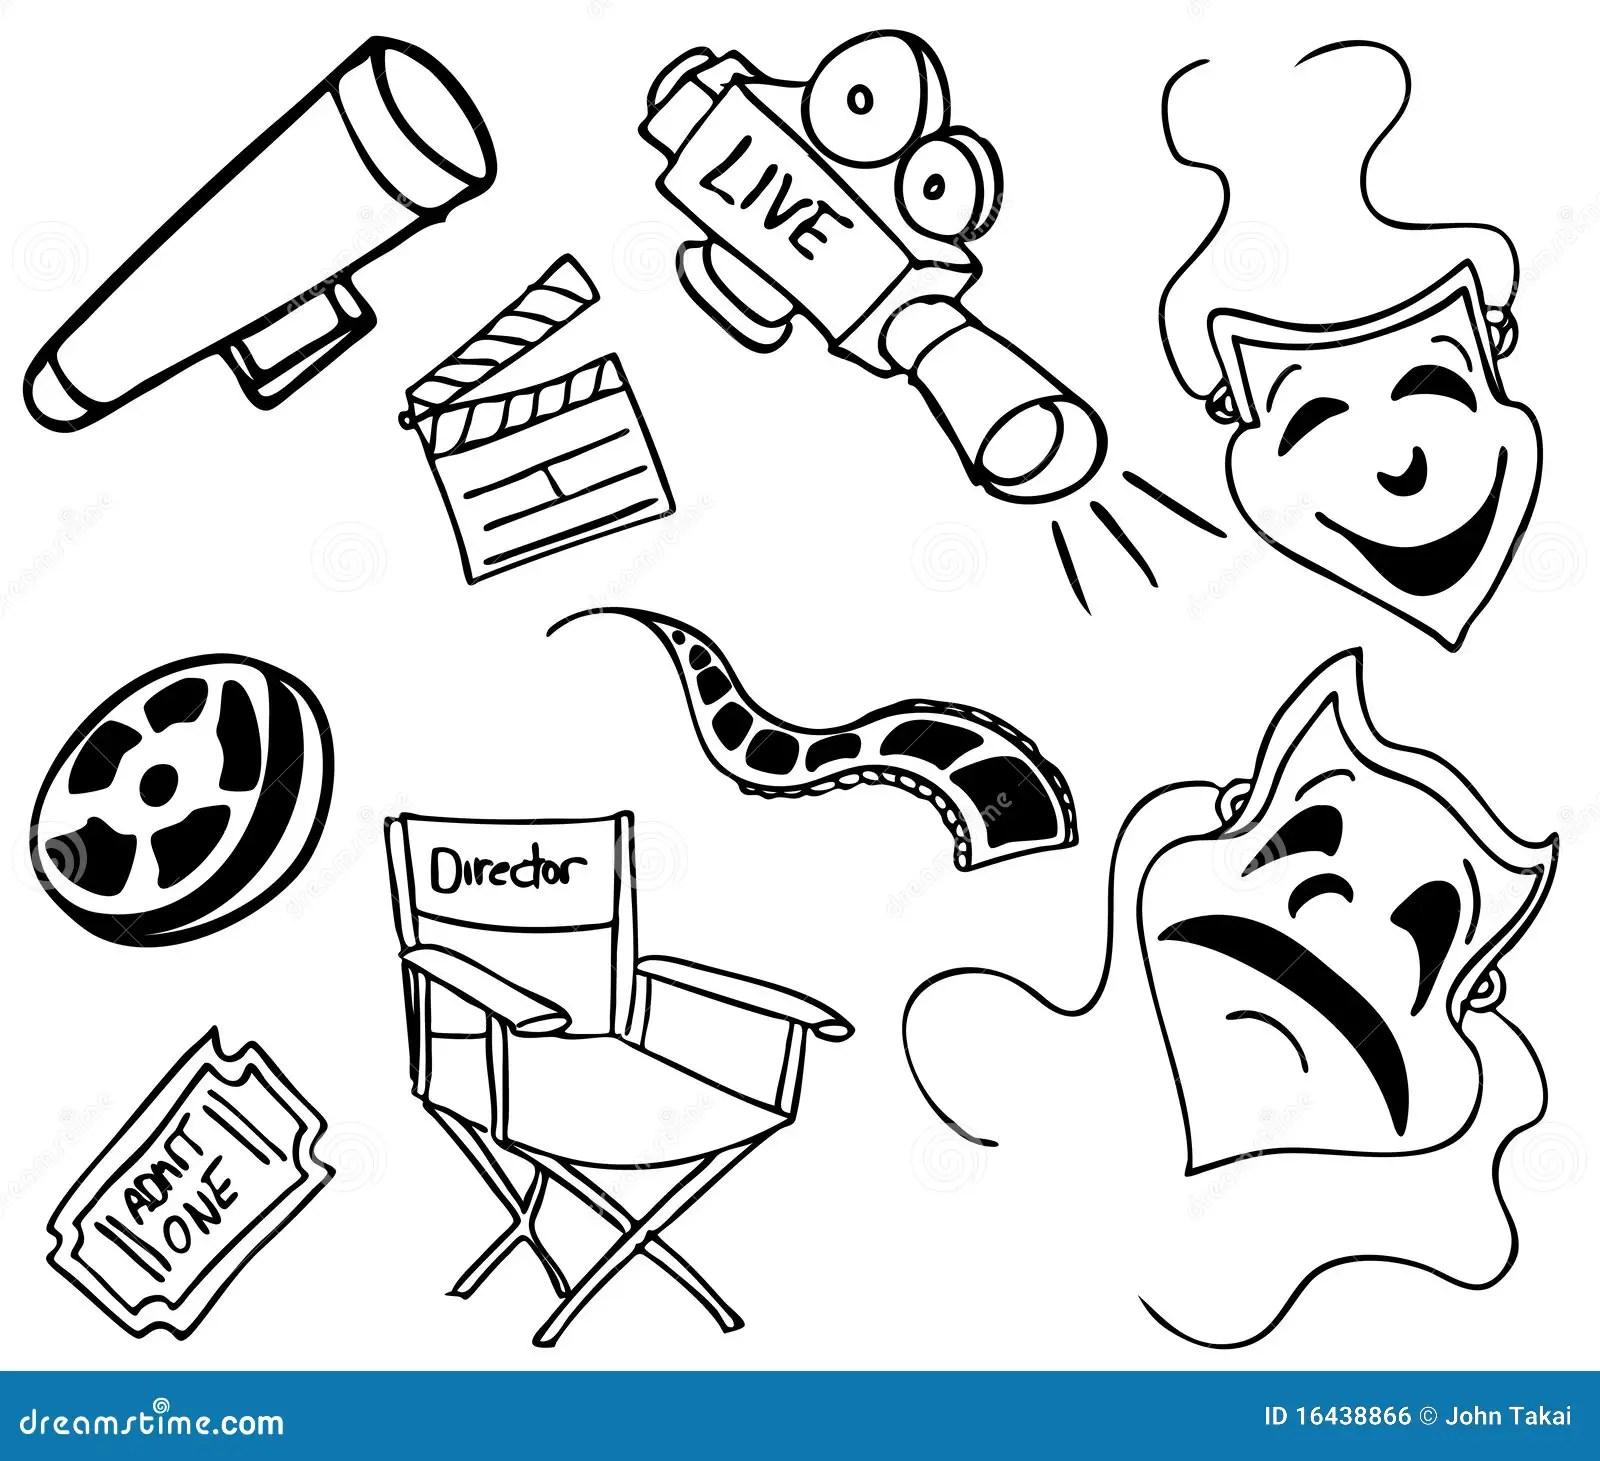 Movie Item Doodles Royalty Free Stock Image